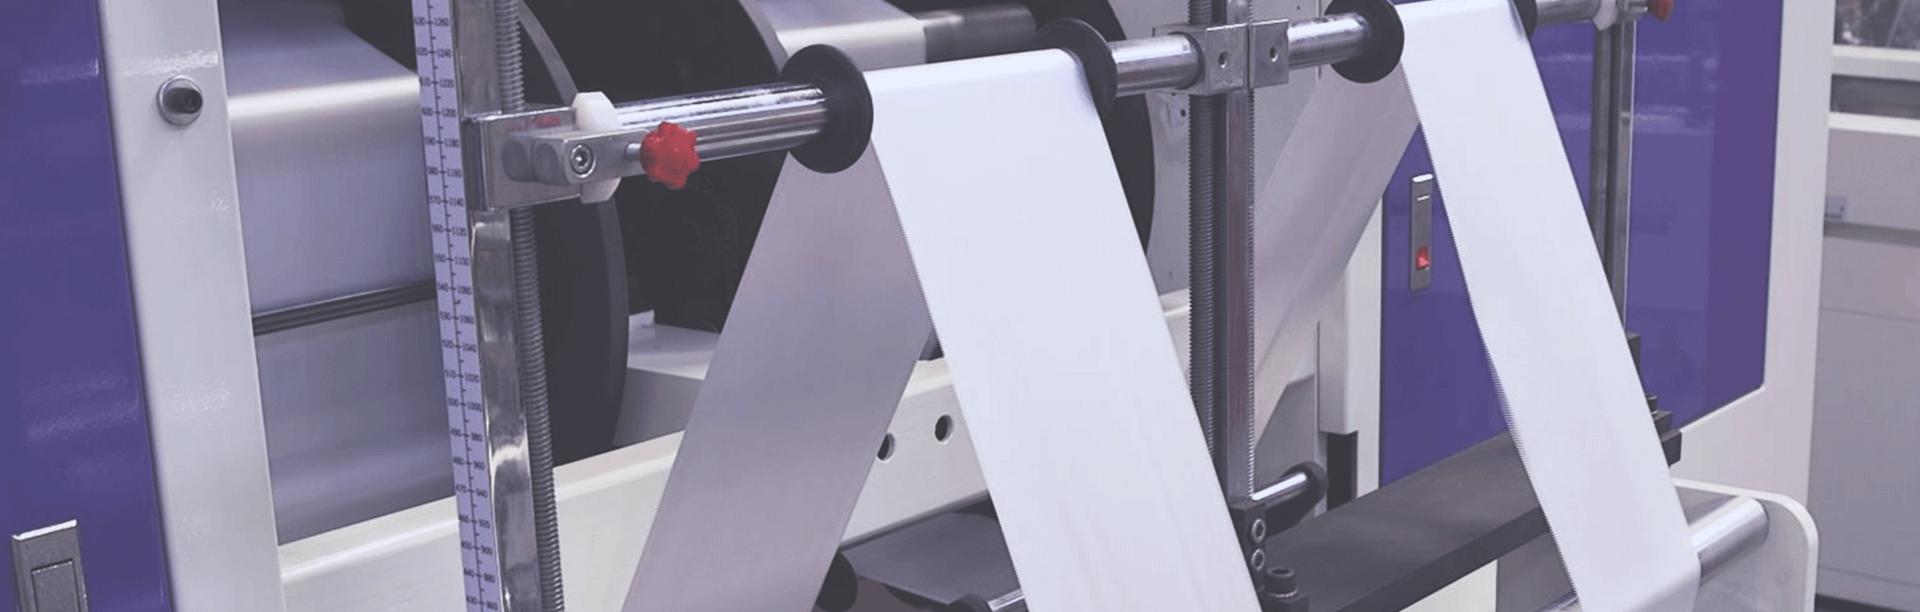 Plastic Bag Making Machine Manufacturers - Parkins Plastic ...